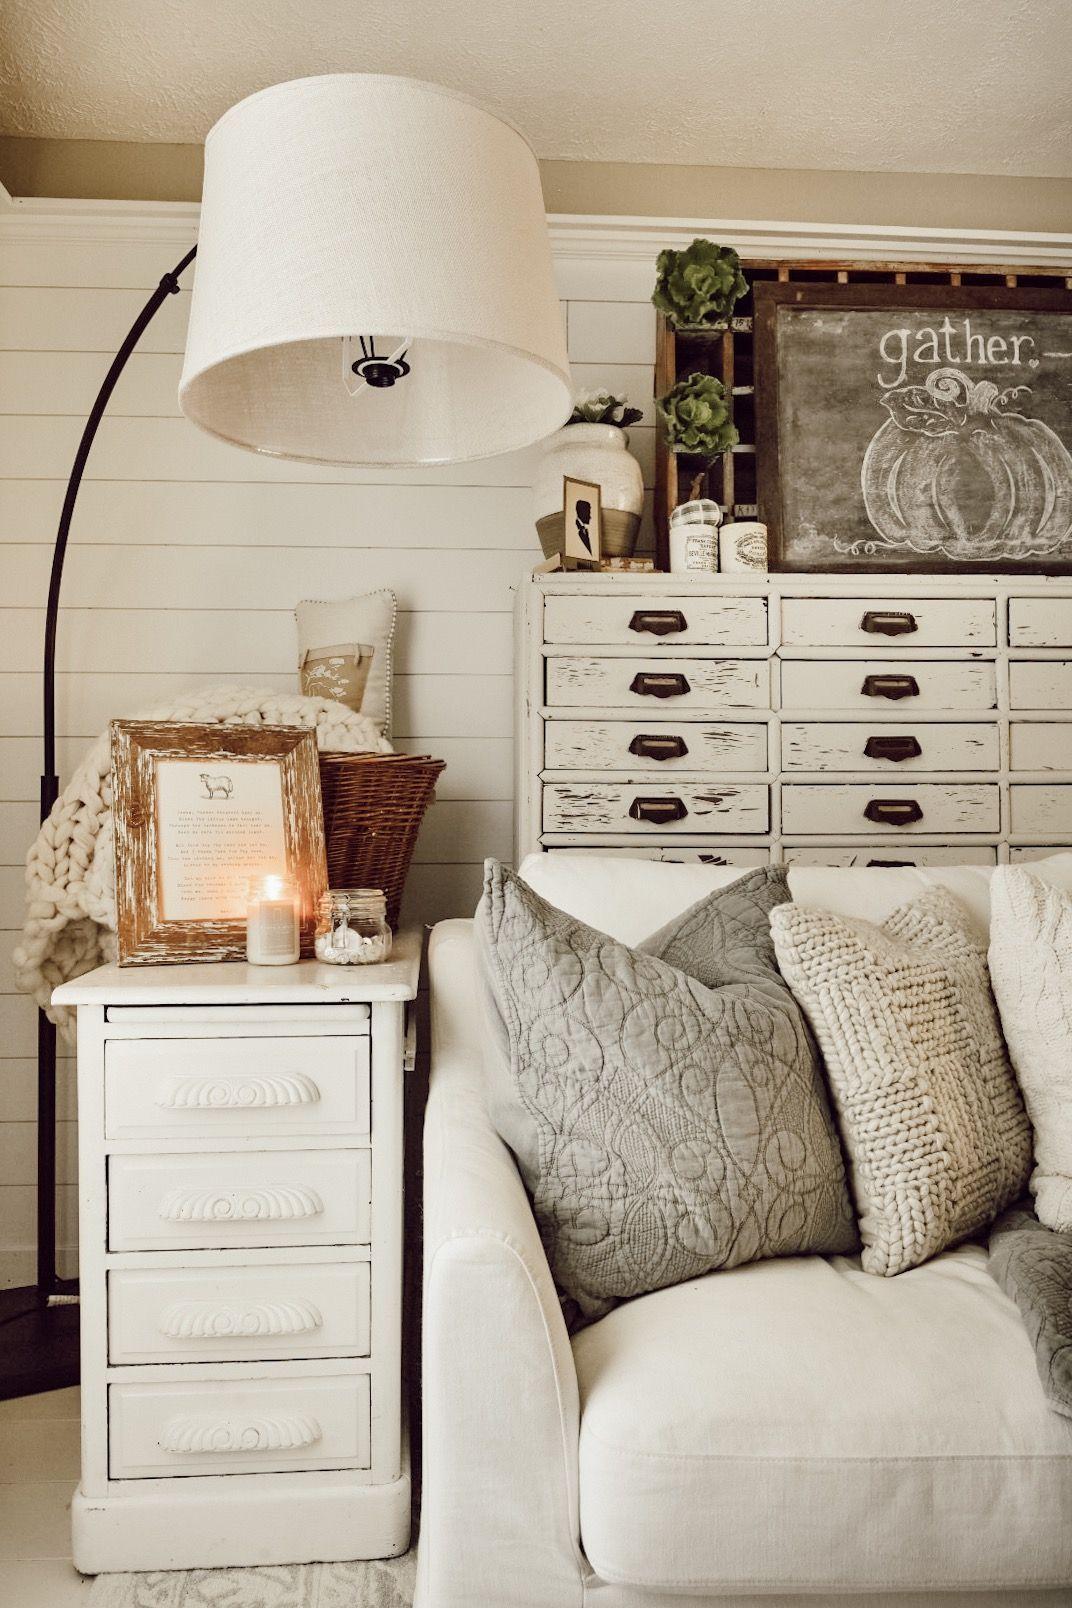 A Simple Cozy Fall Family Room Family Room Design Family Room Decor